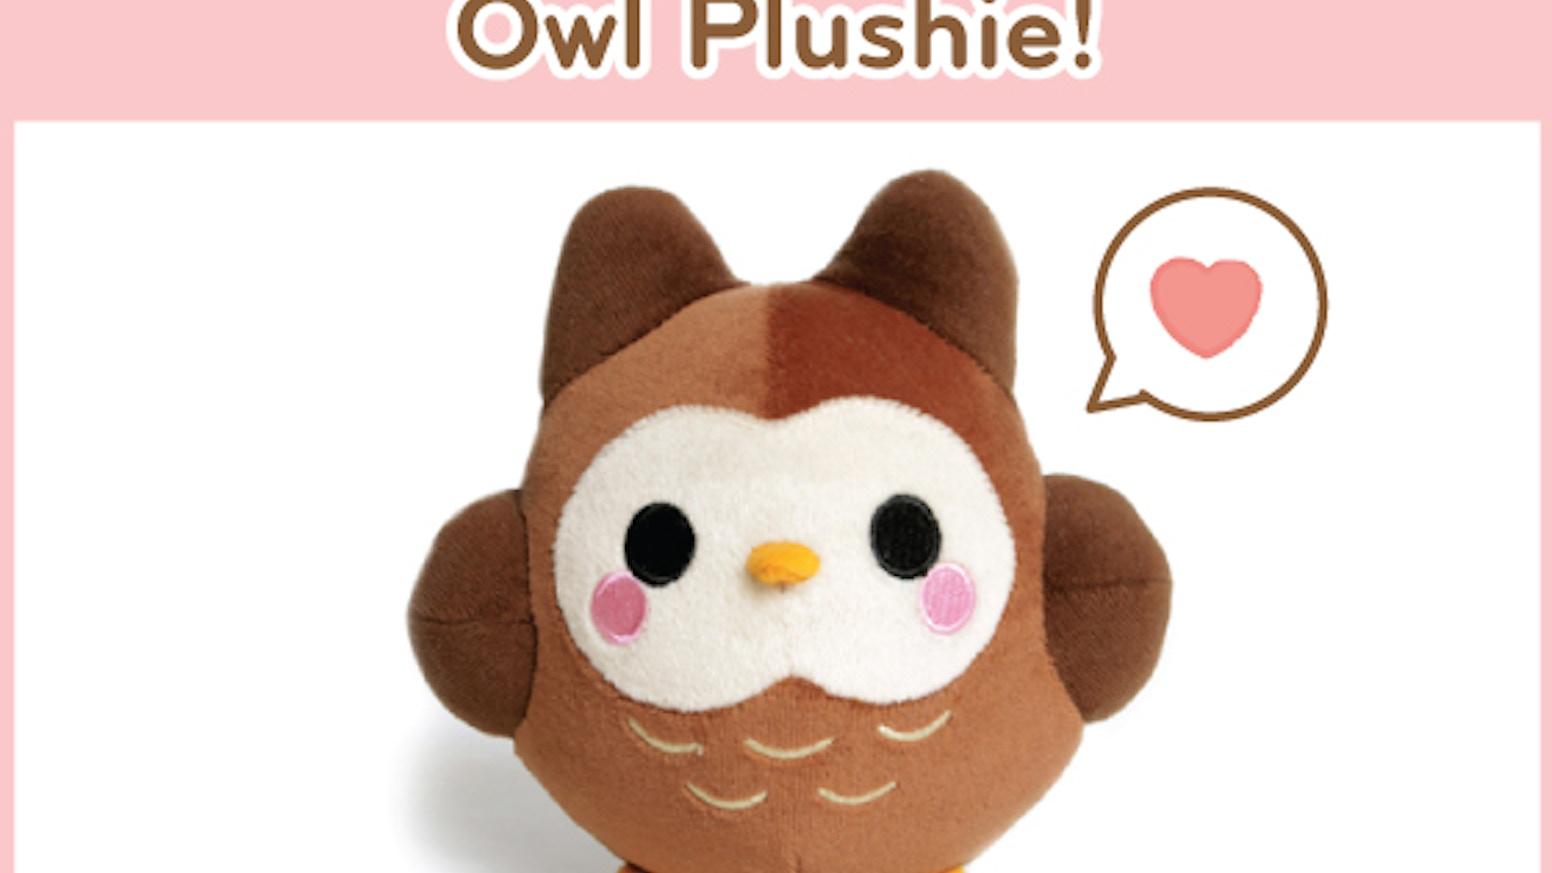 Oborocharms Kawaii Owl Plushie By Kim Rountree Kickstarter